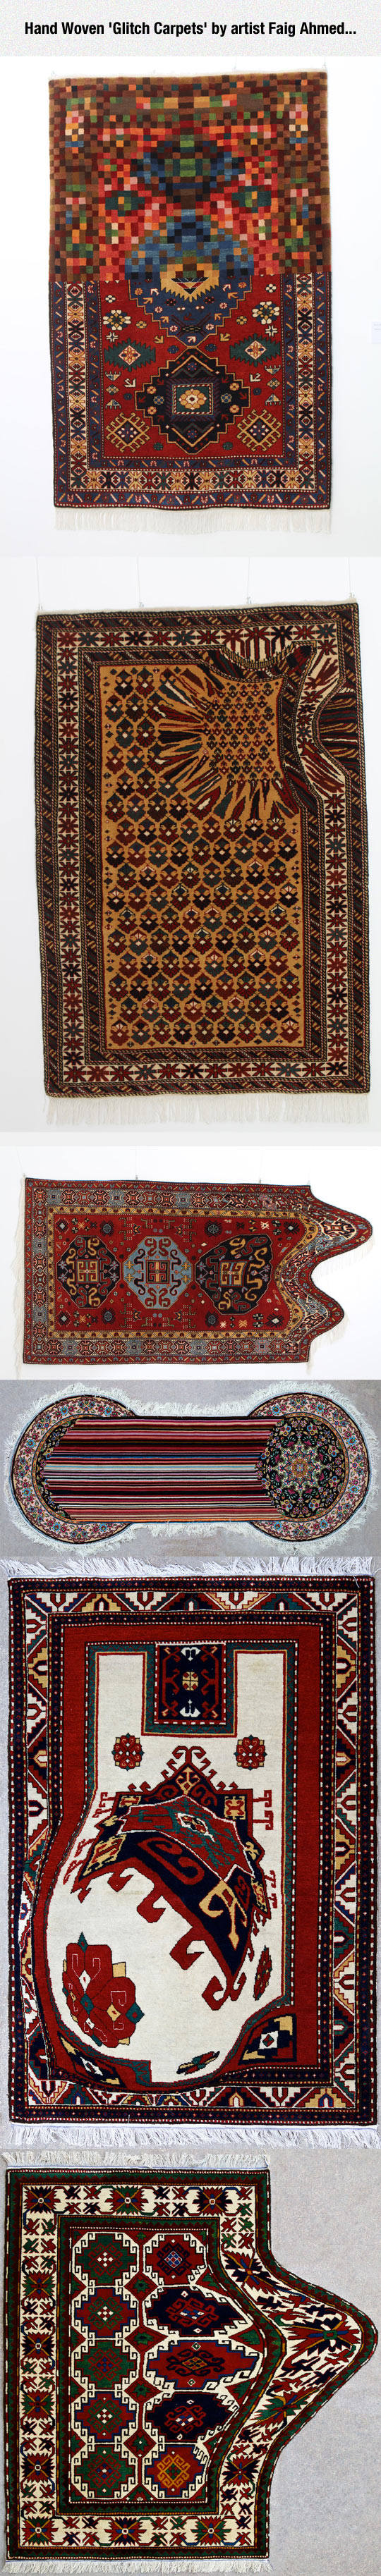 cool-carpets-handmade-glitch-art